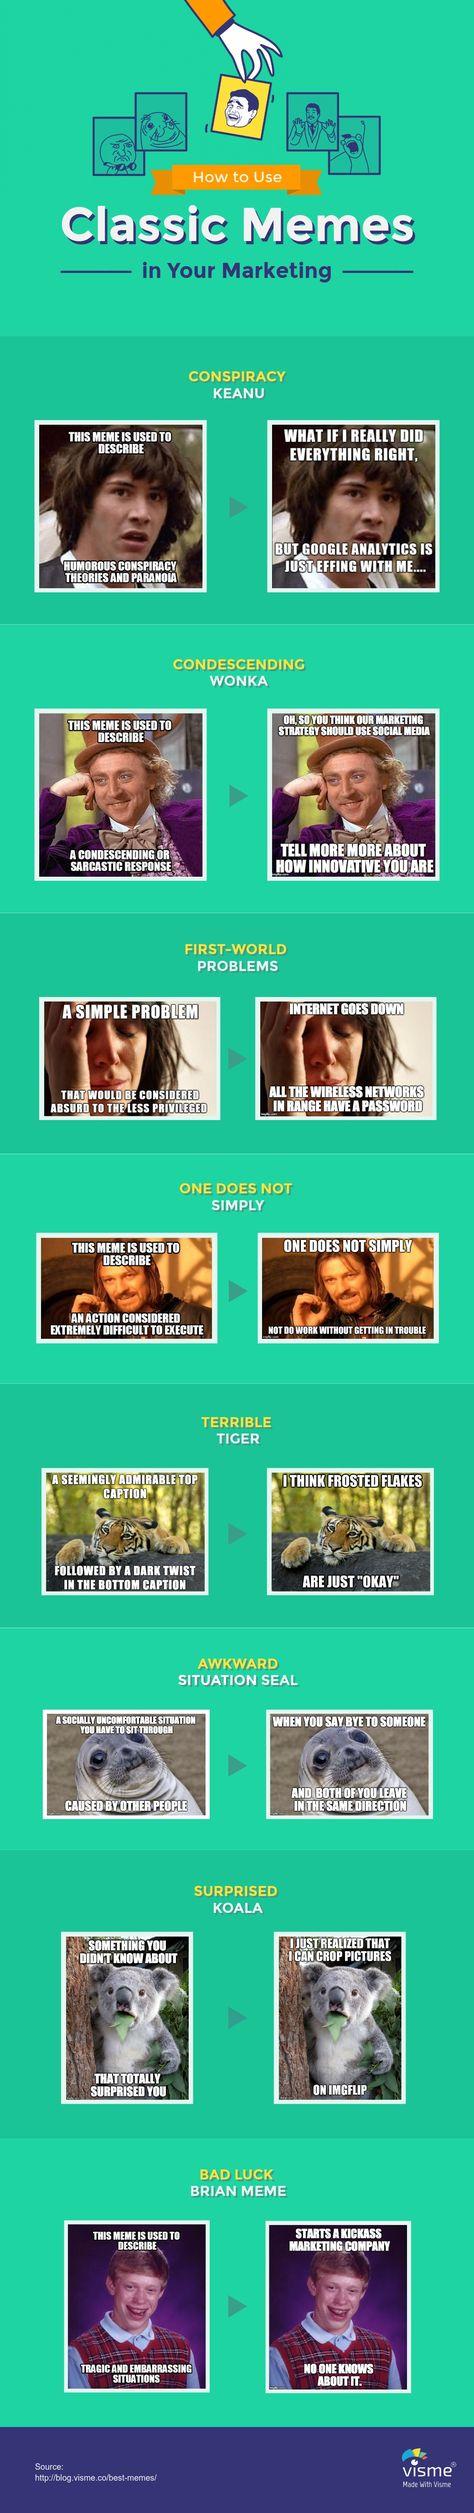 The Best Memes for Social Media Marketing [Visual Guide]